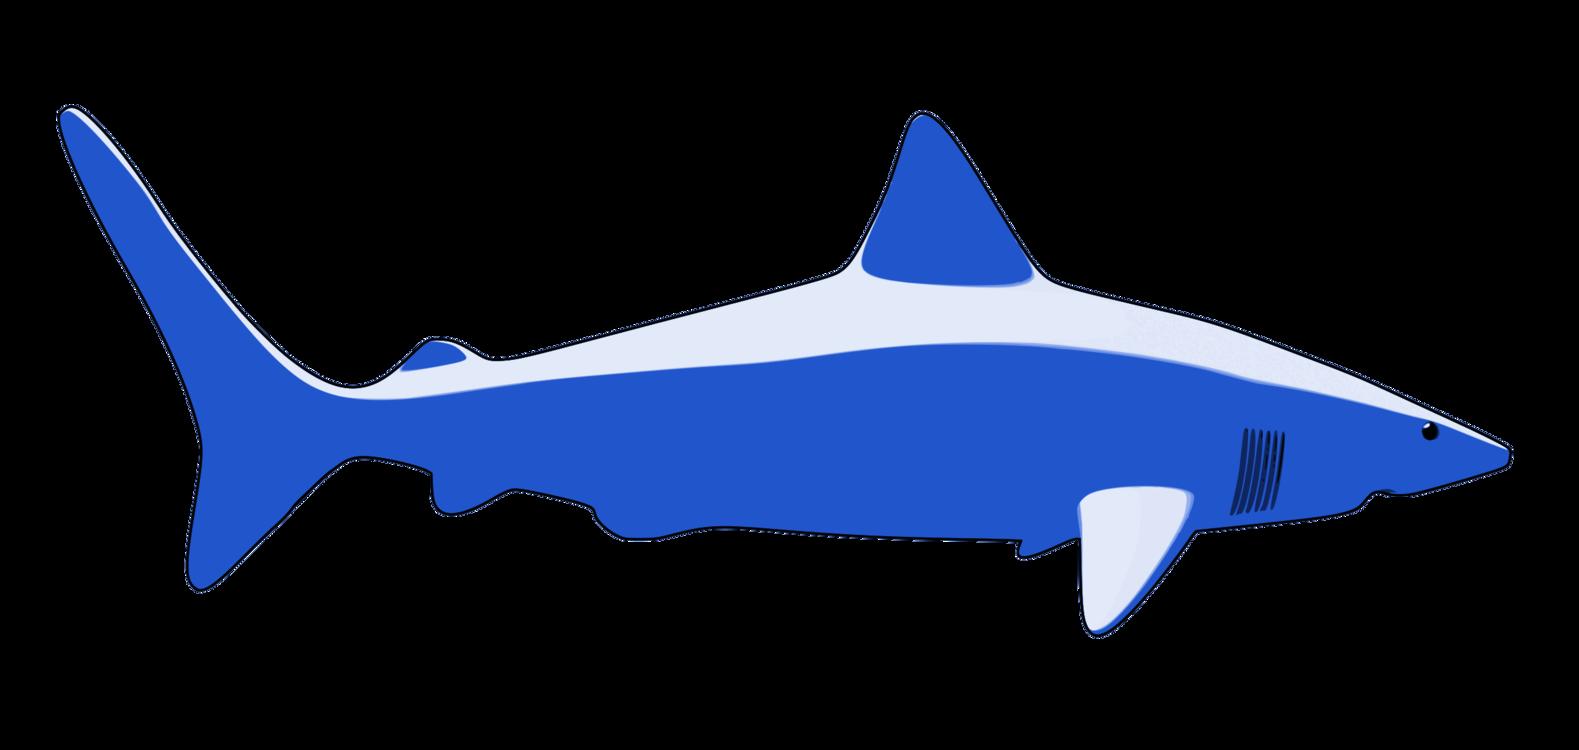 Marine Biology,Shark,Organism